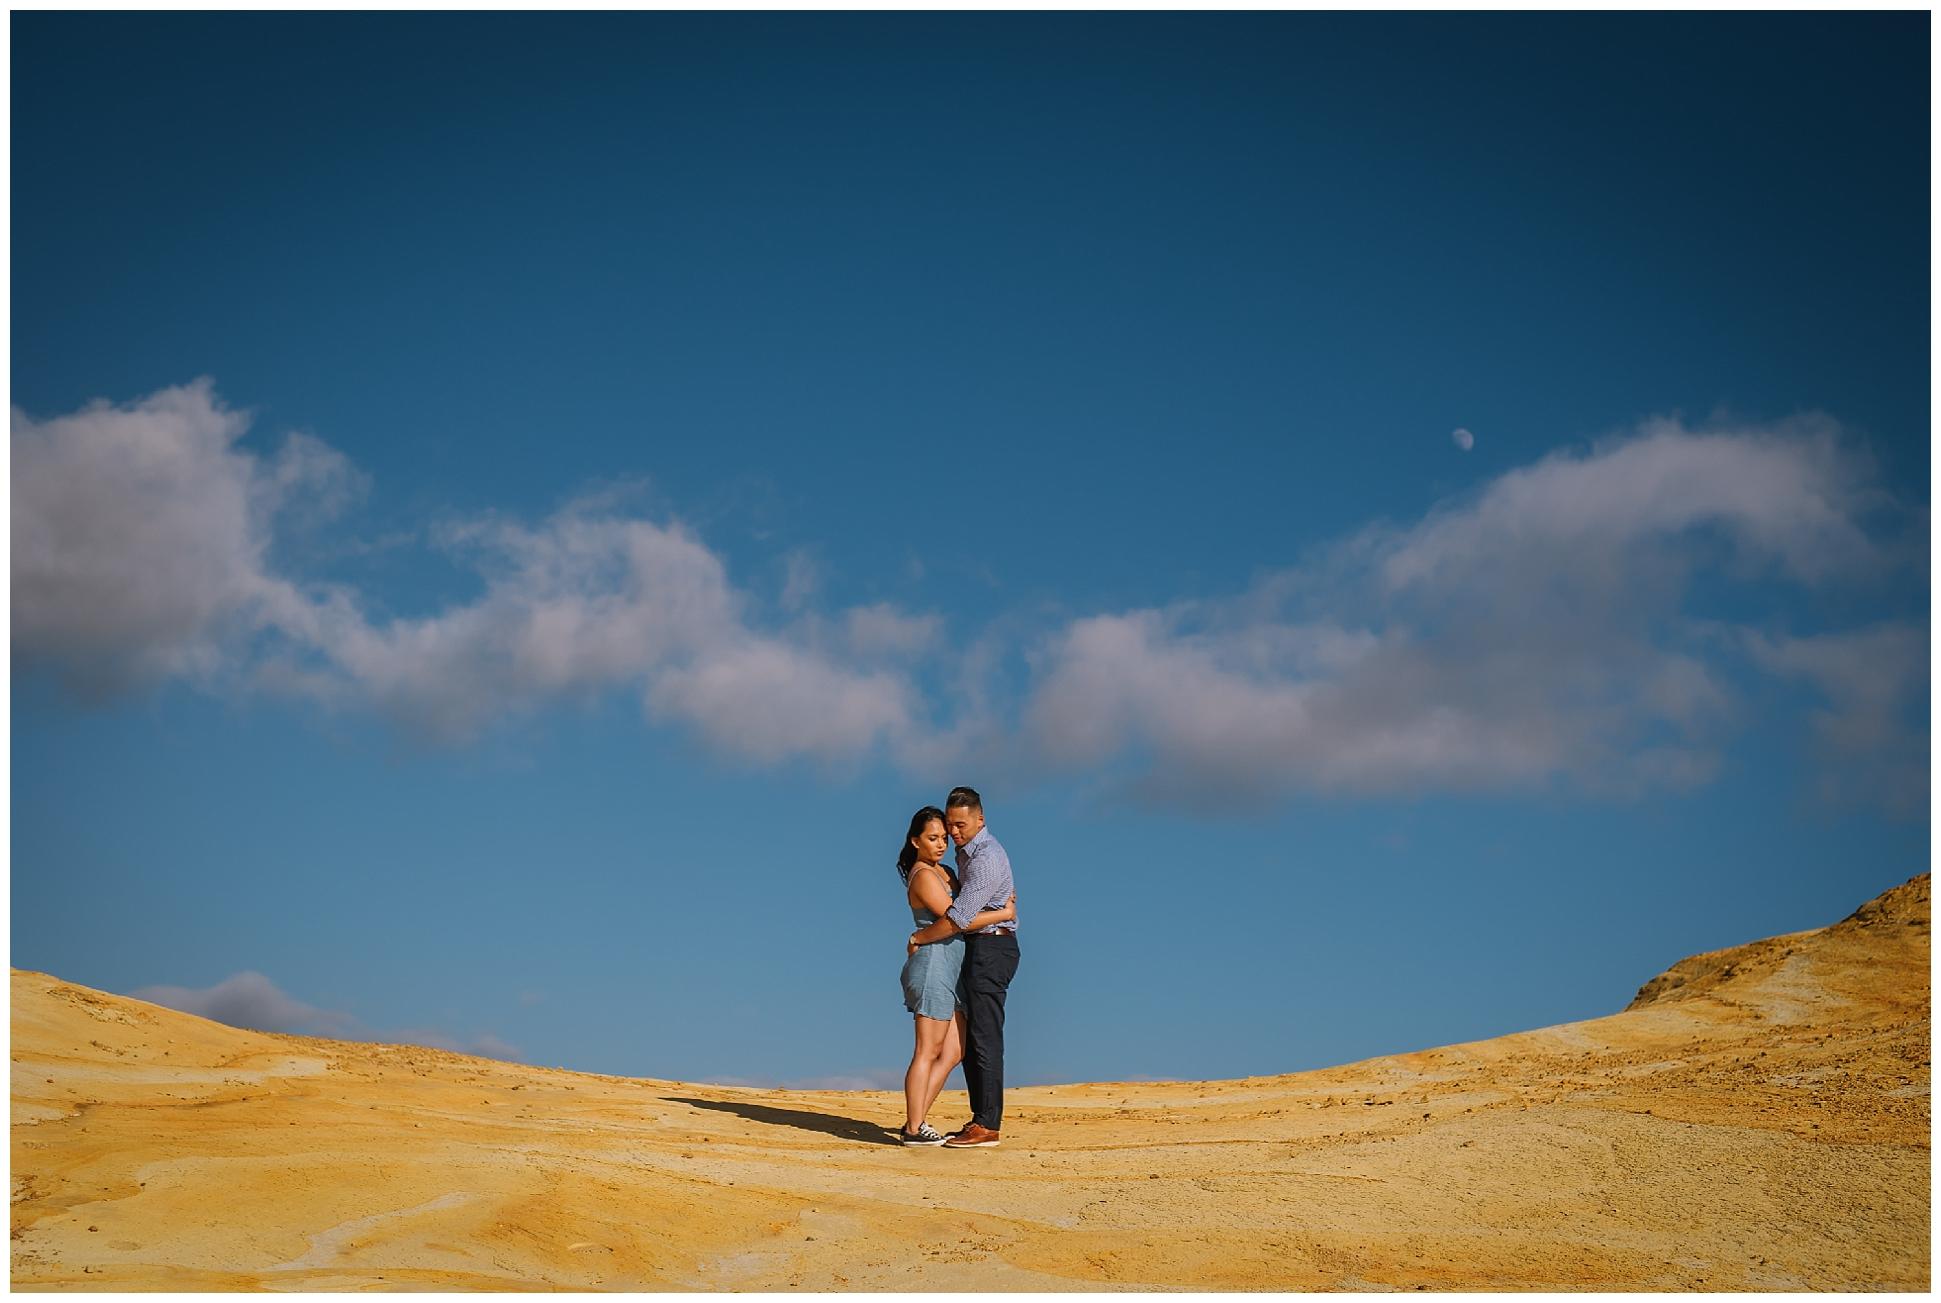 Cape-kiwanda-bridal-portrait-destination-wedding-photographer_0002.jpg